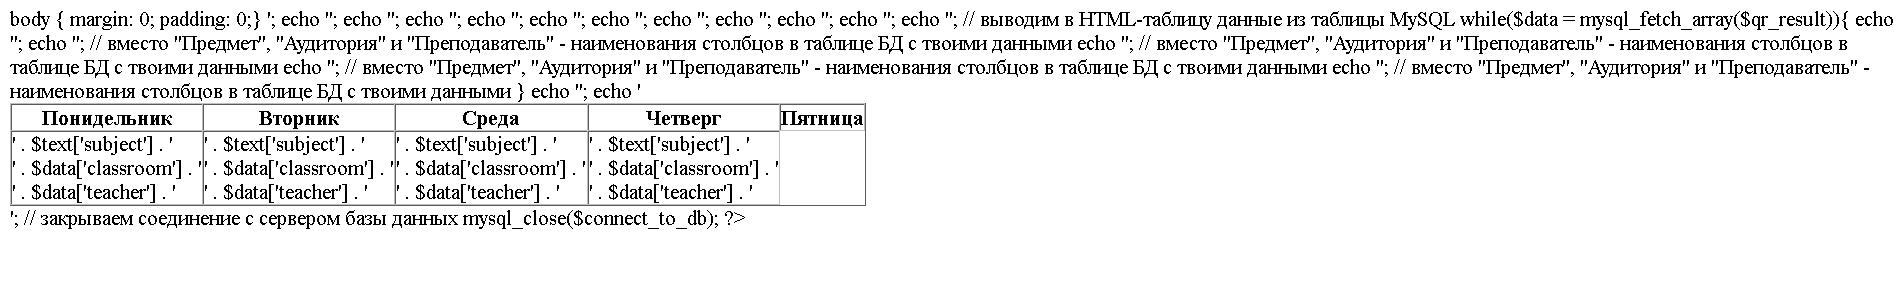 a109d271a28c4fe2b0b4c9584b821c58.jpg